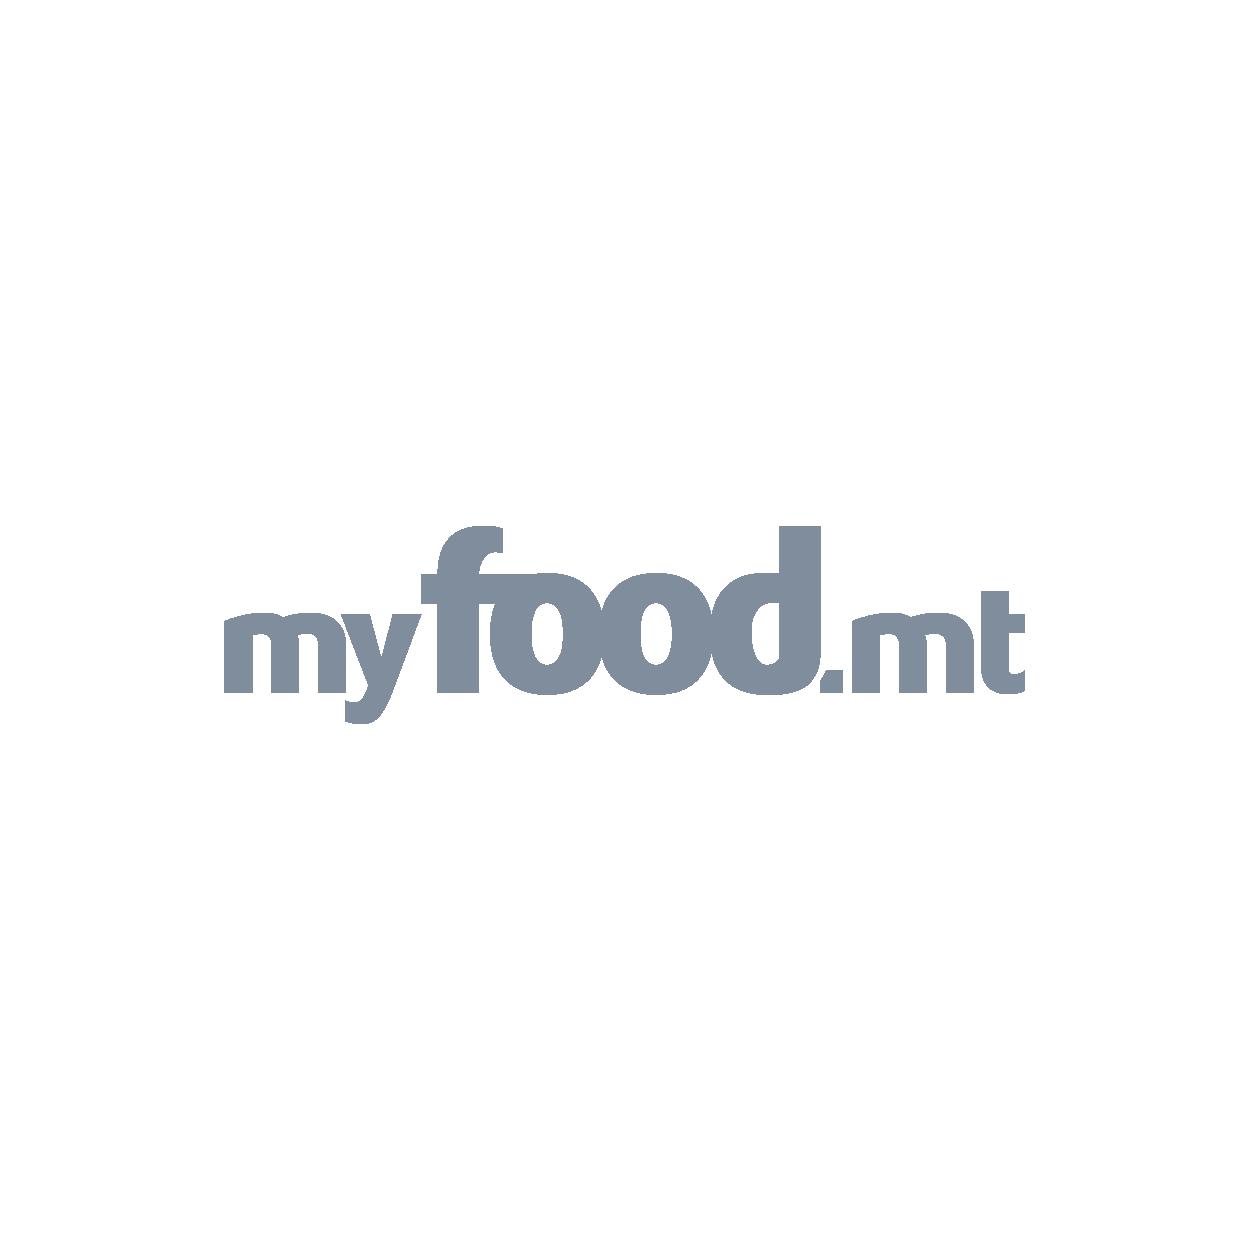 myfood.mt logo